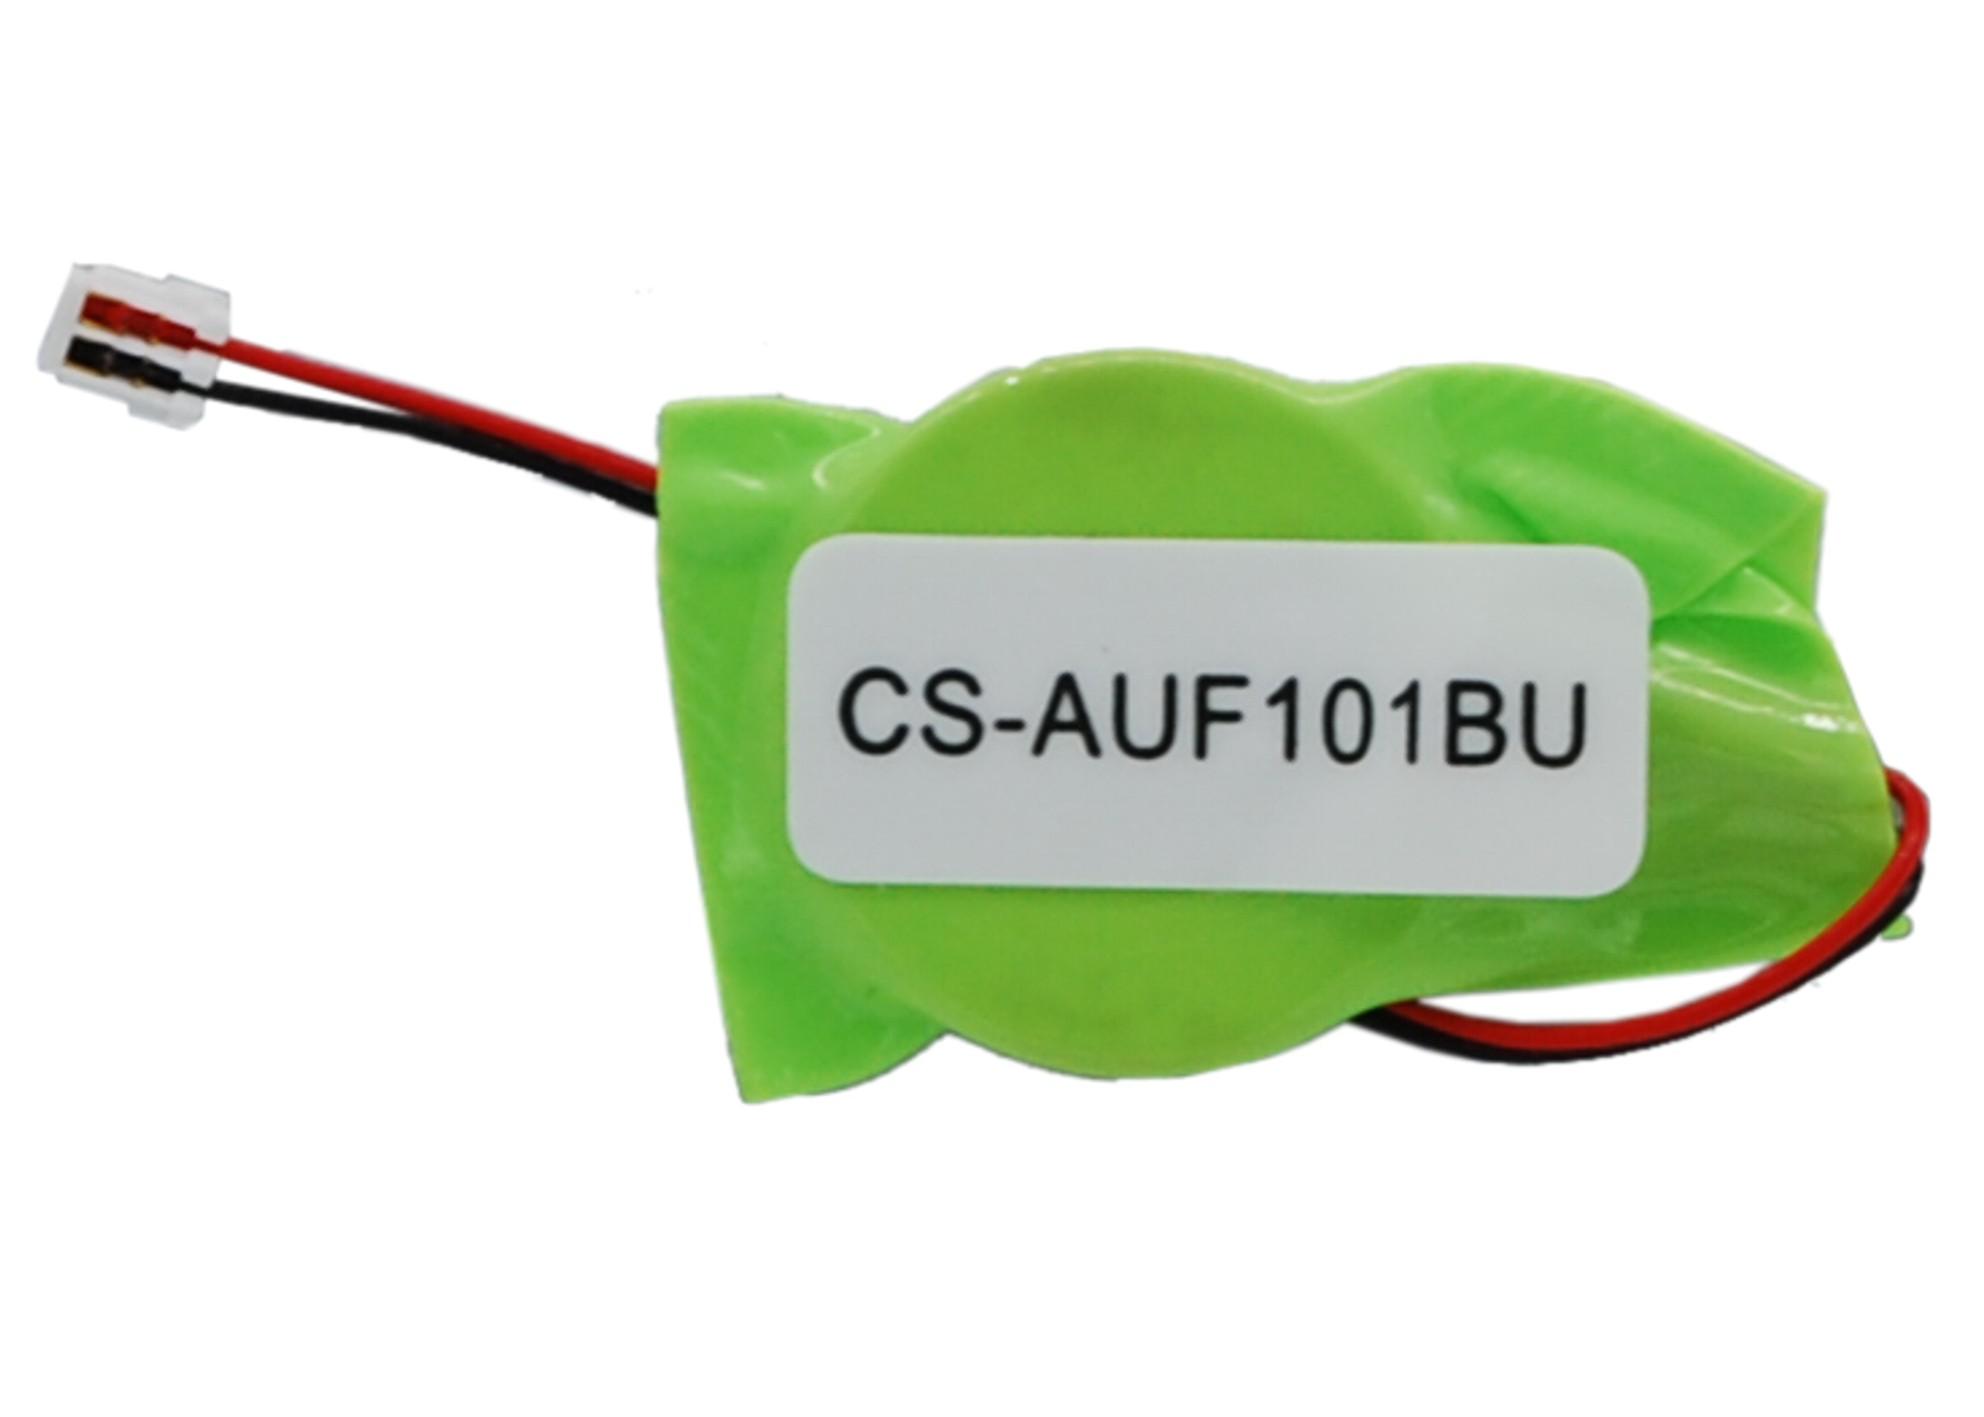 Cameron Sino baterie cmos pro ASUS Eee Pad Transformer TF101-1B028A 3V Li-ion 40mAh zelená - neoriginální